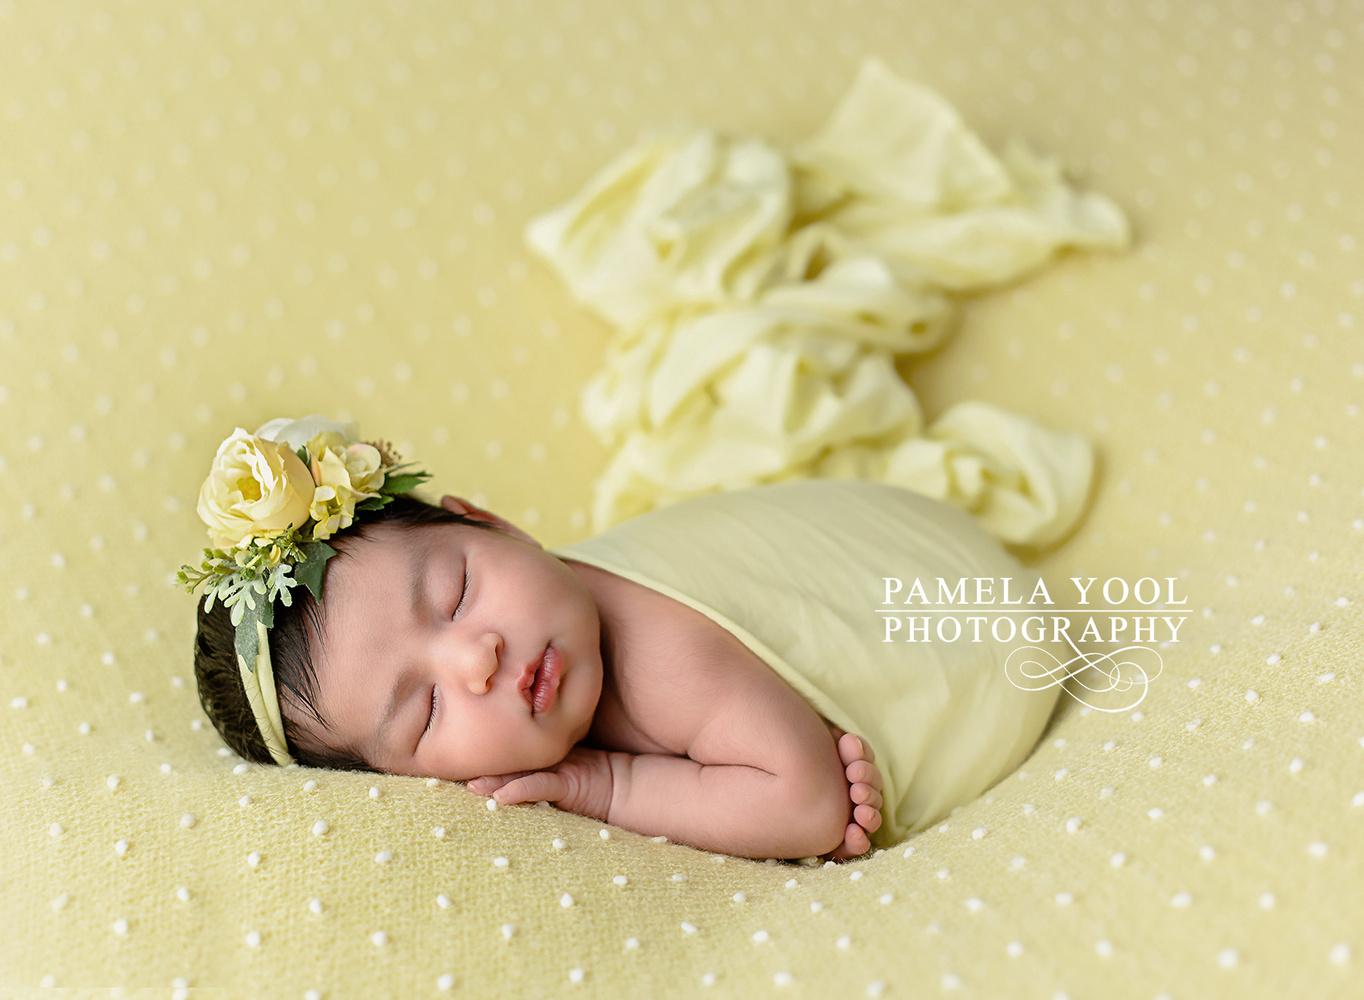 Newborn Baby Julia by Pamela Yool www.pamelayool.com by Pamela Yool